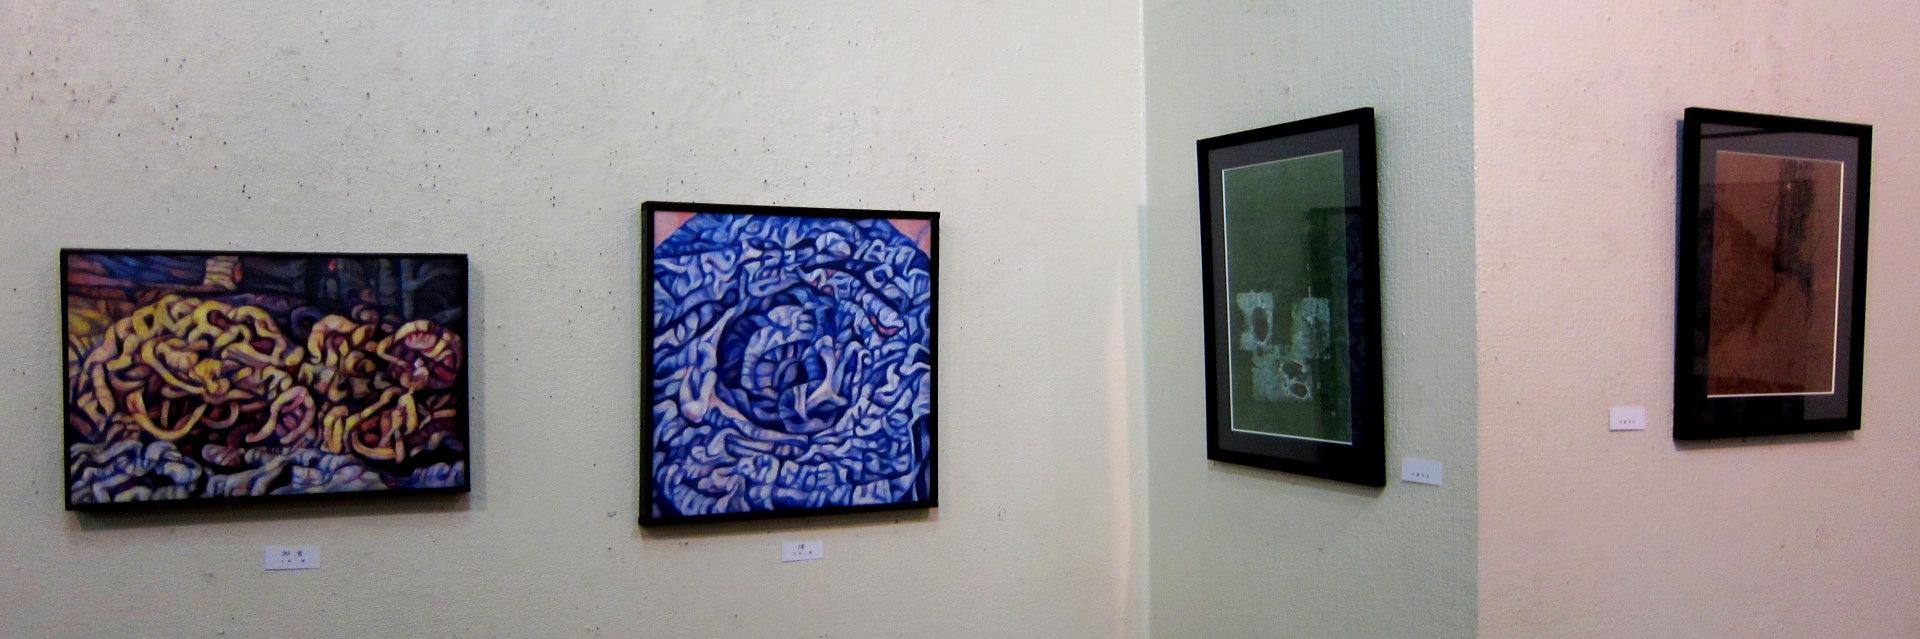 2354) 「LA`TAPIO -Ⅱ- Exhibition」 たぴお 1月27日(月)~2月15日(土)_f0126829_10104372.jpg